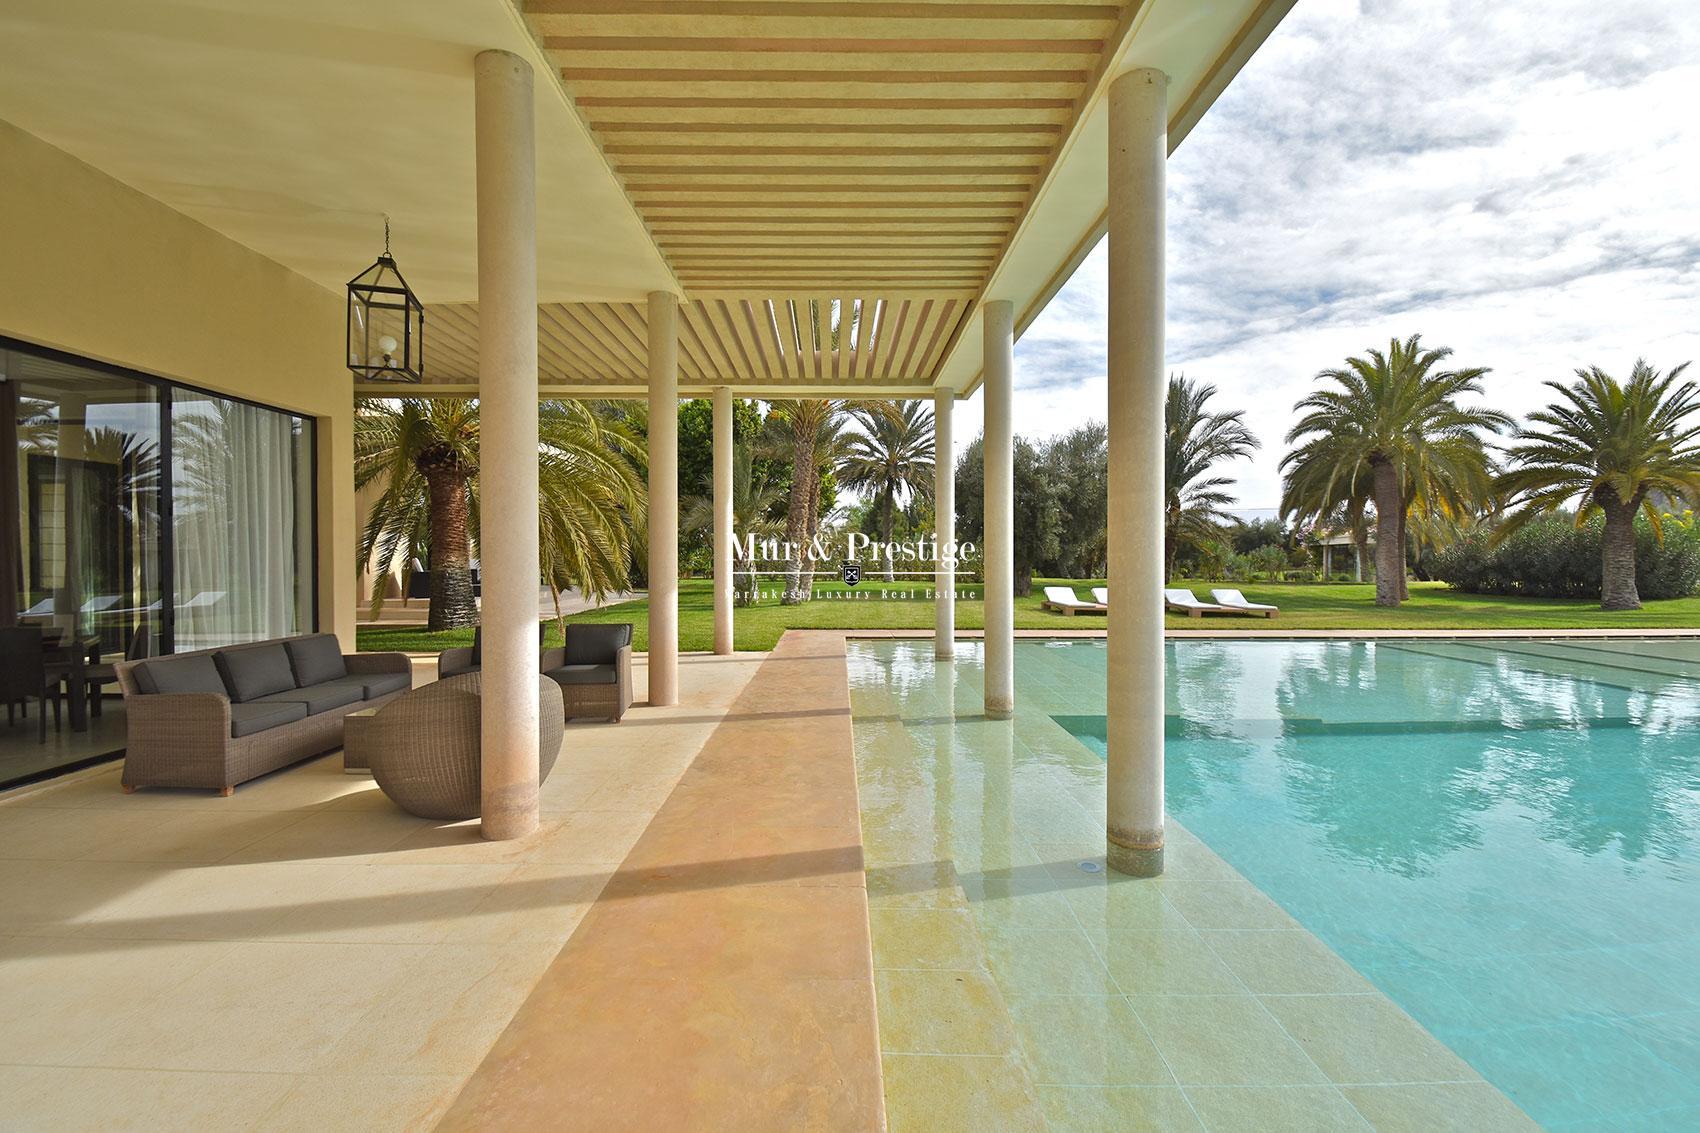 Immobilier de luxe Marrakech